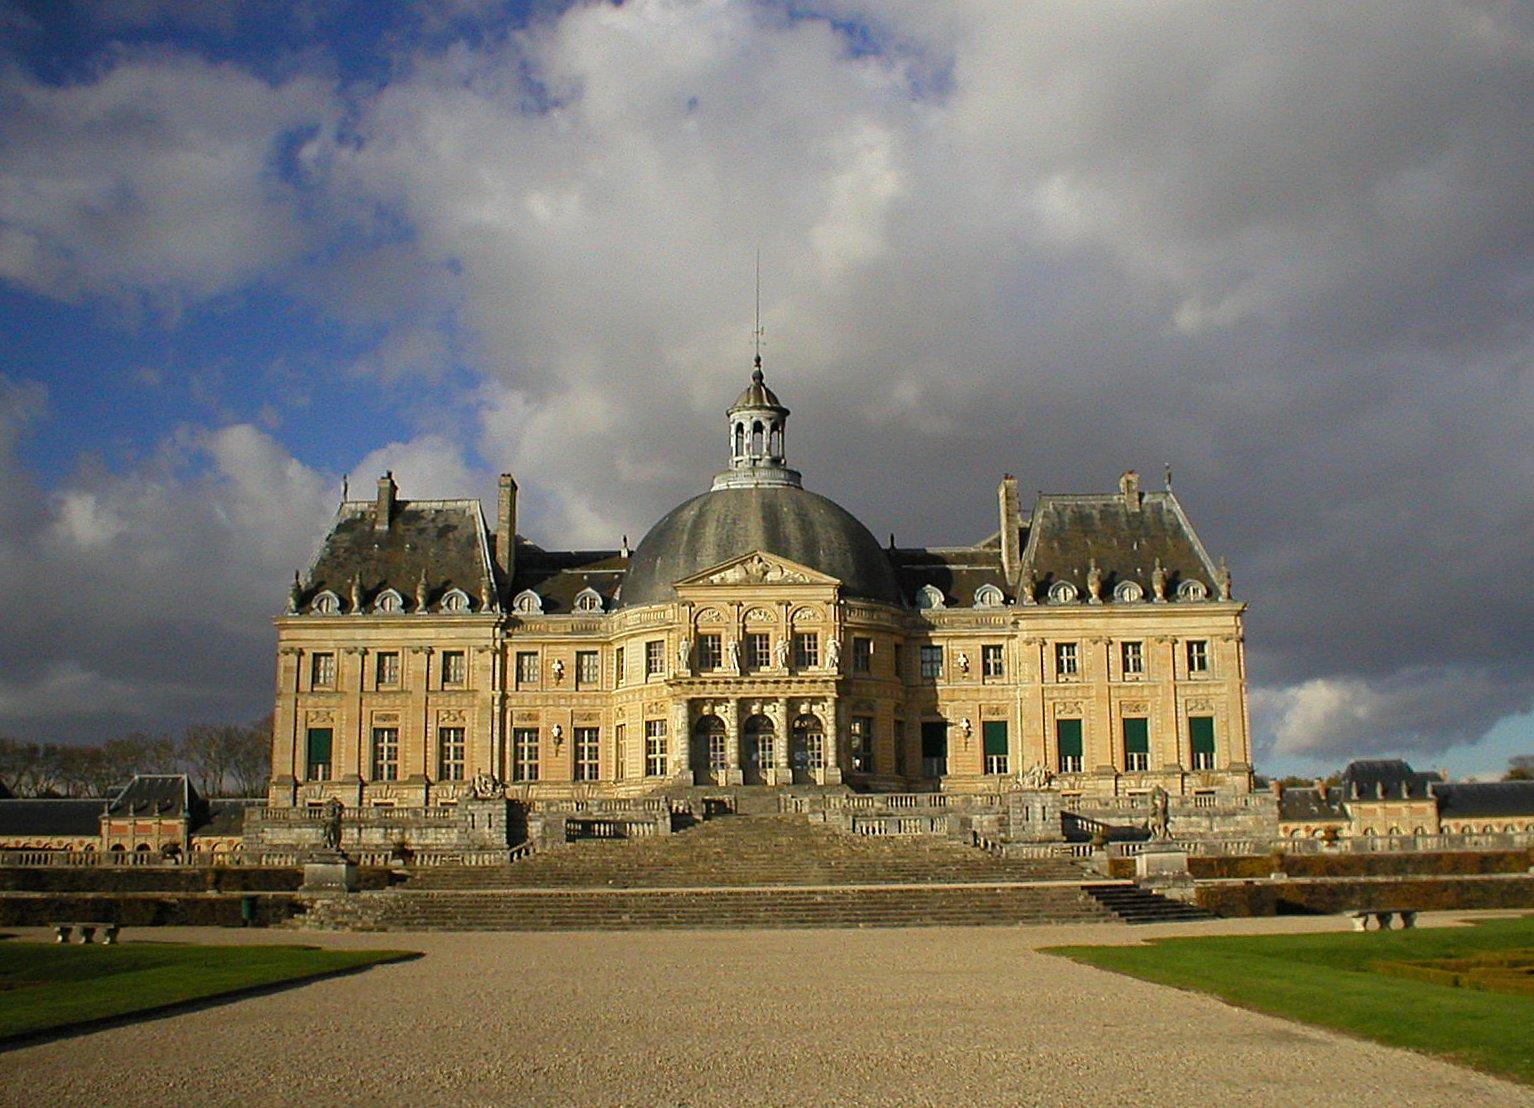 France20November20200220067-3aaeaac